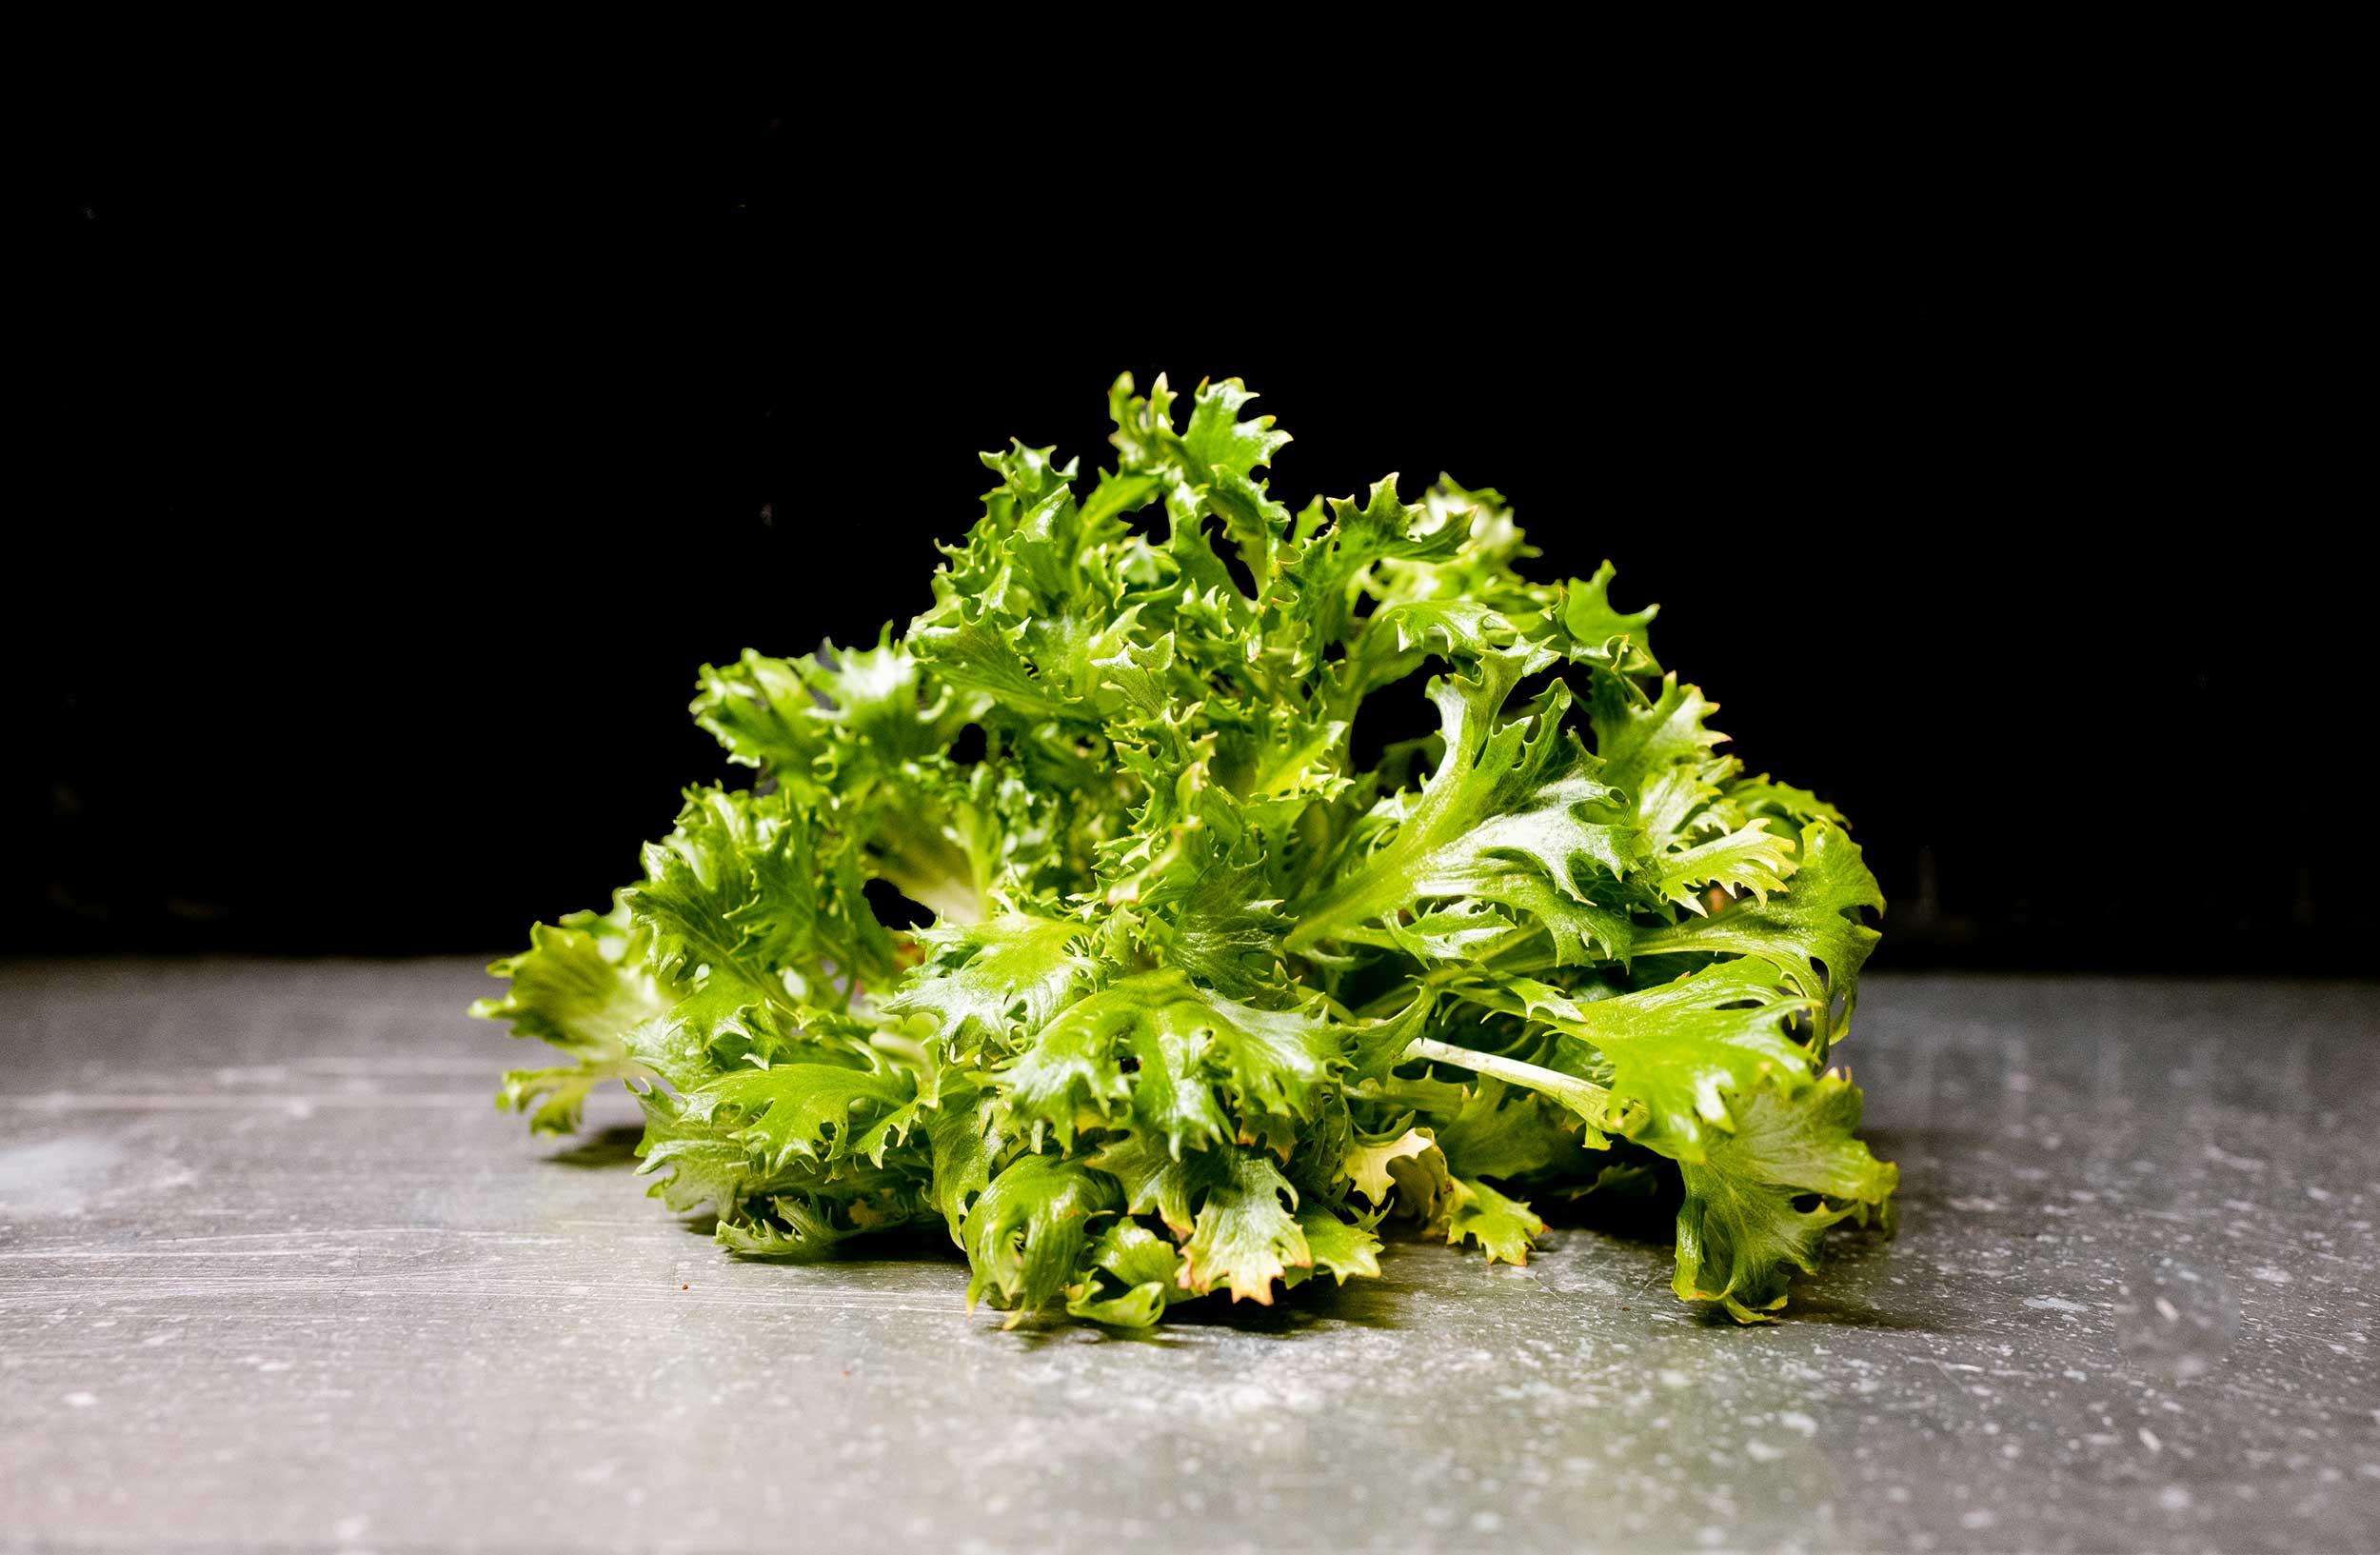 Hammock-Greens-Crops-2.jpg